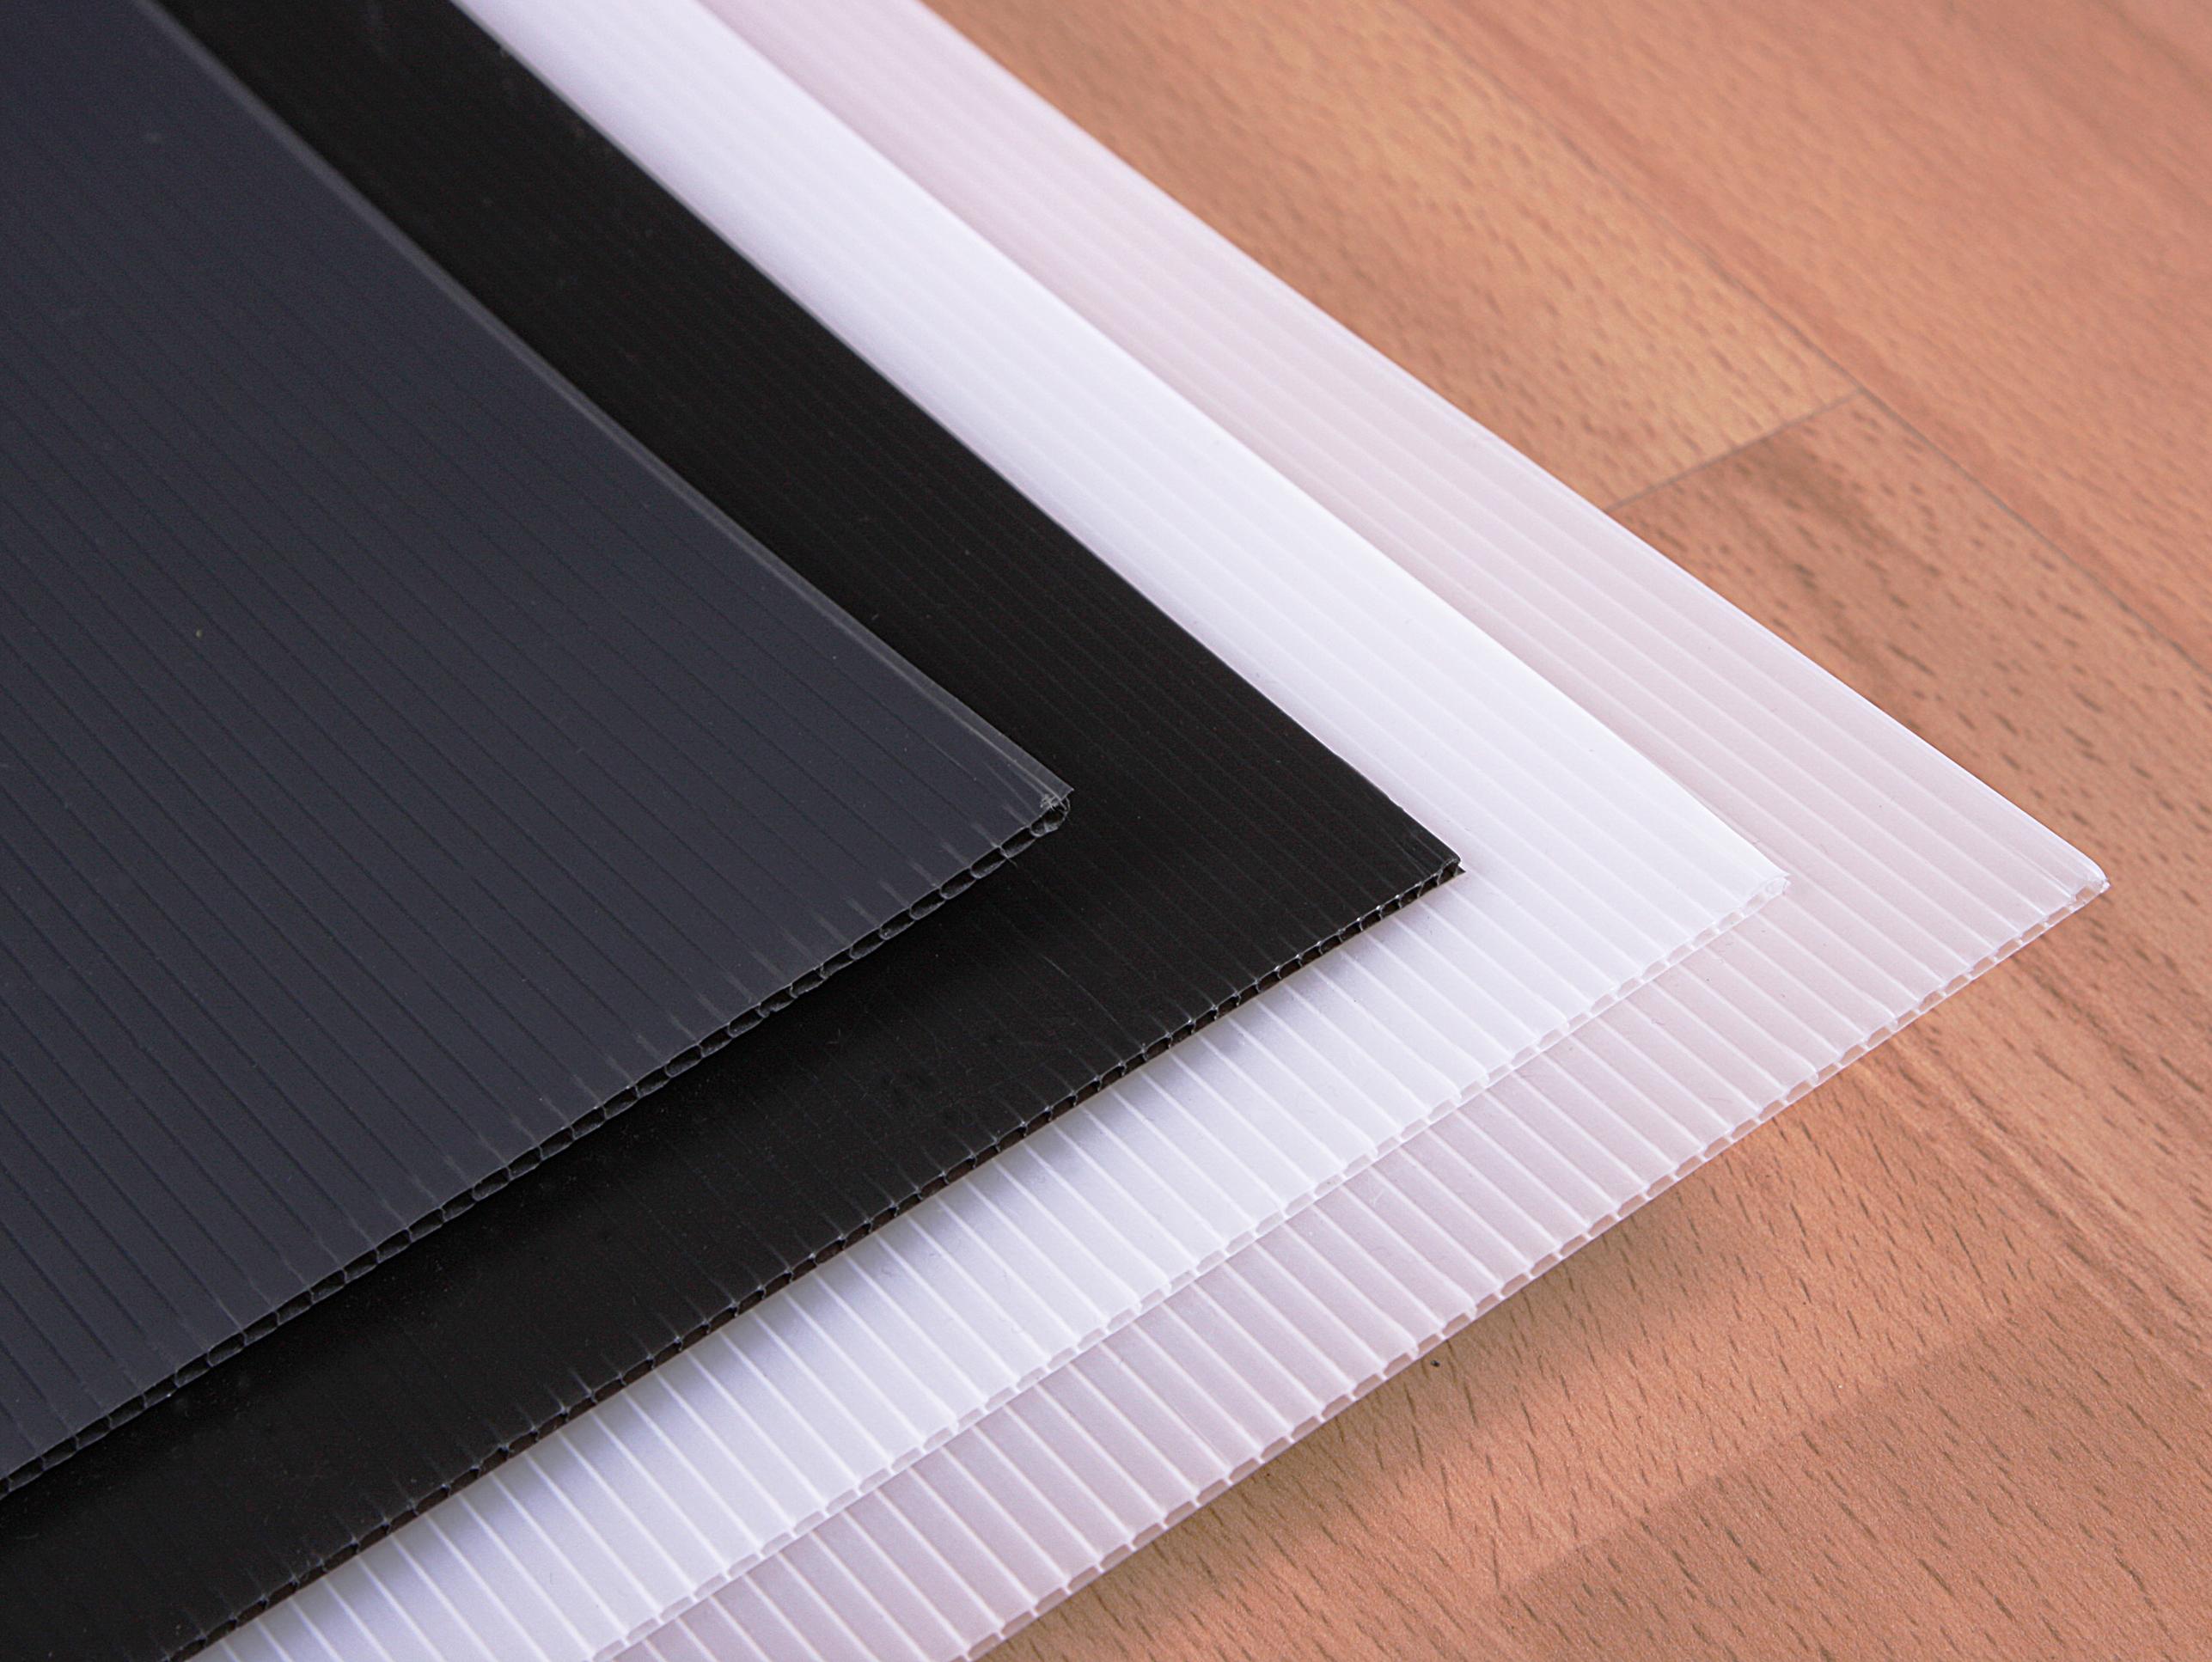 False Floor Covering Material